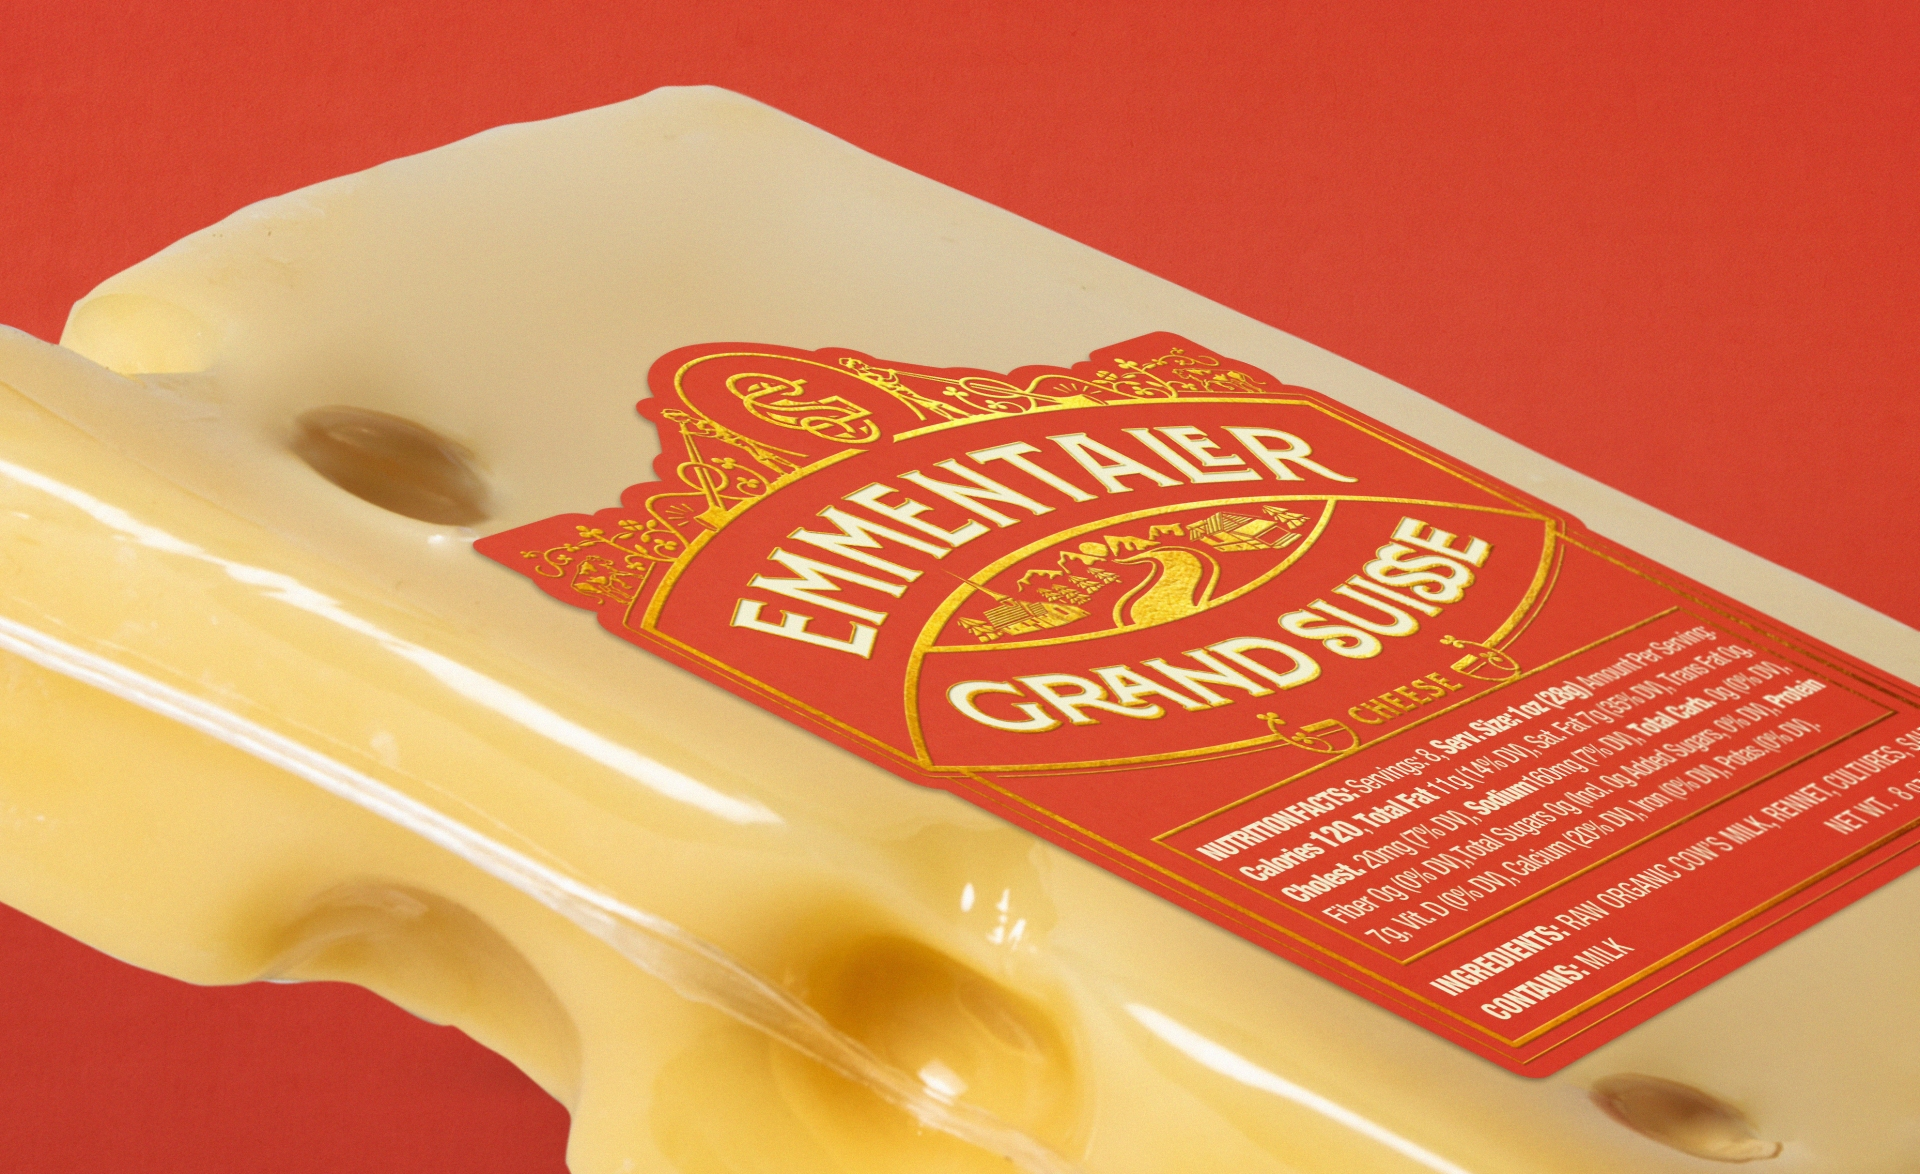 label-cheese-emmentaler-flat-preview-grand-suisse-close-zeki-michael-design-branding-studio-packaging-red copy copy copy